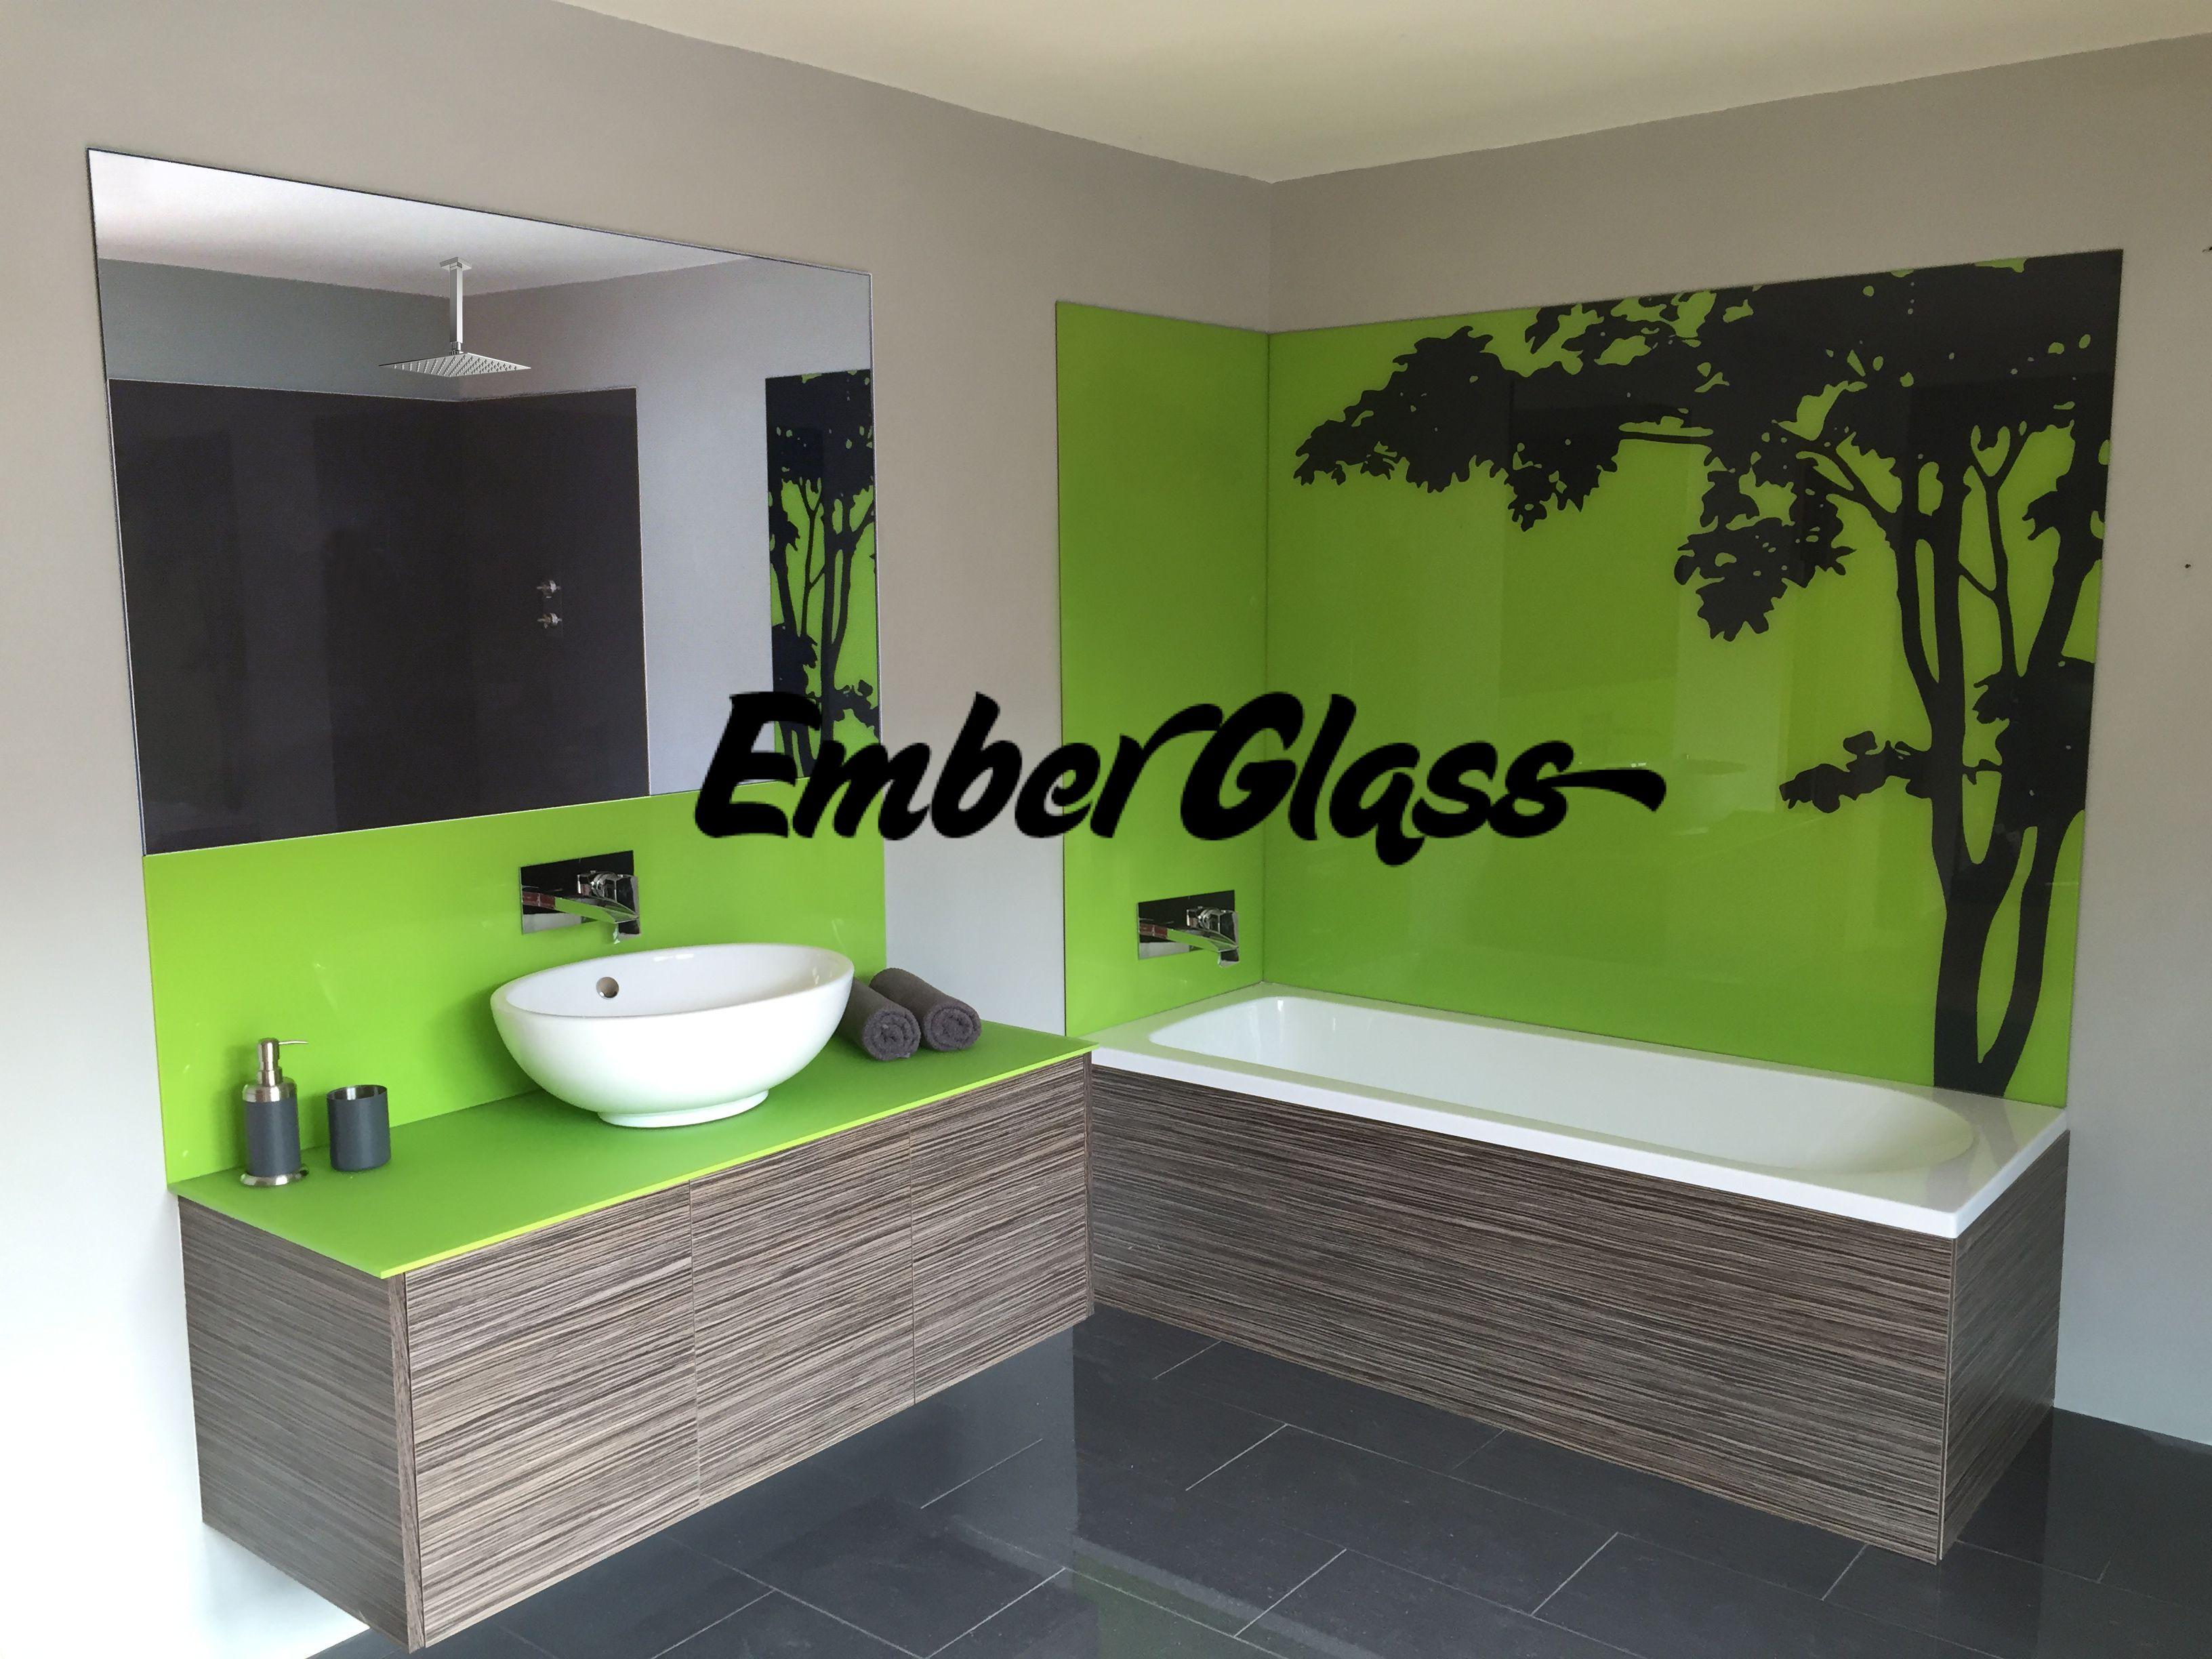 Bathroom sink splashback ideas - Glass Splashback Glass Bathroom Wet Room Ember Glass Create Beautiful Glass Bathrooms